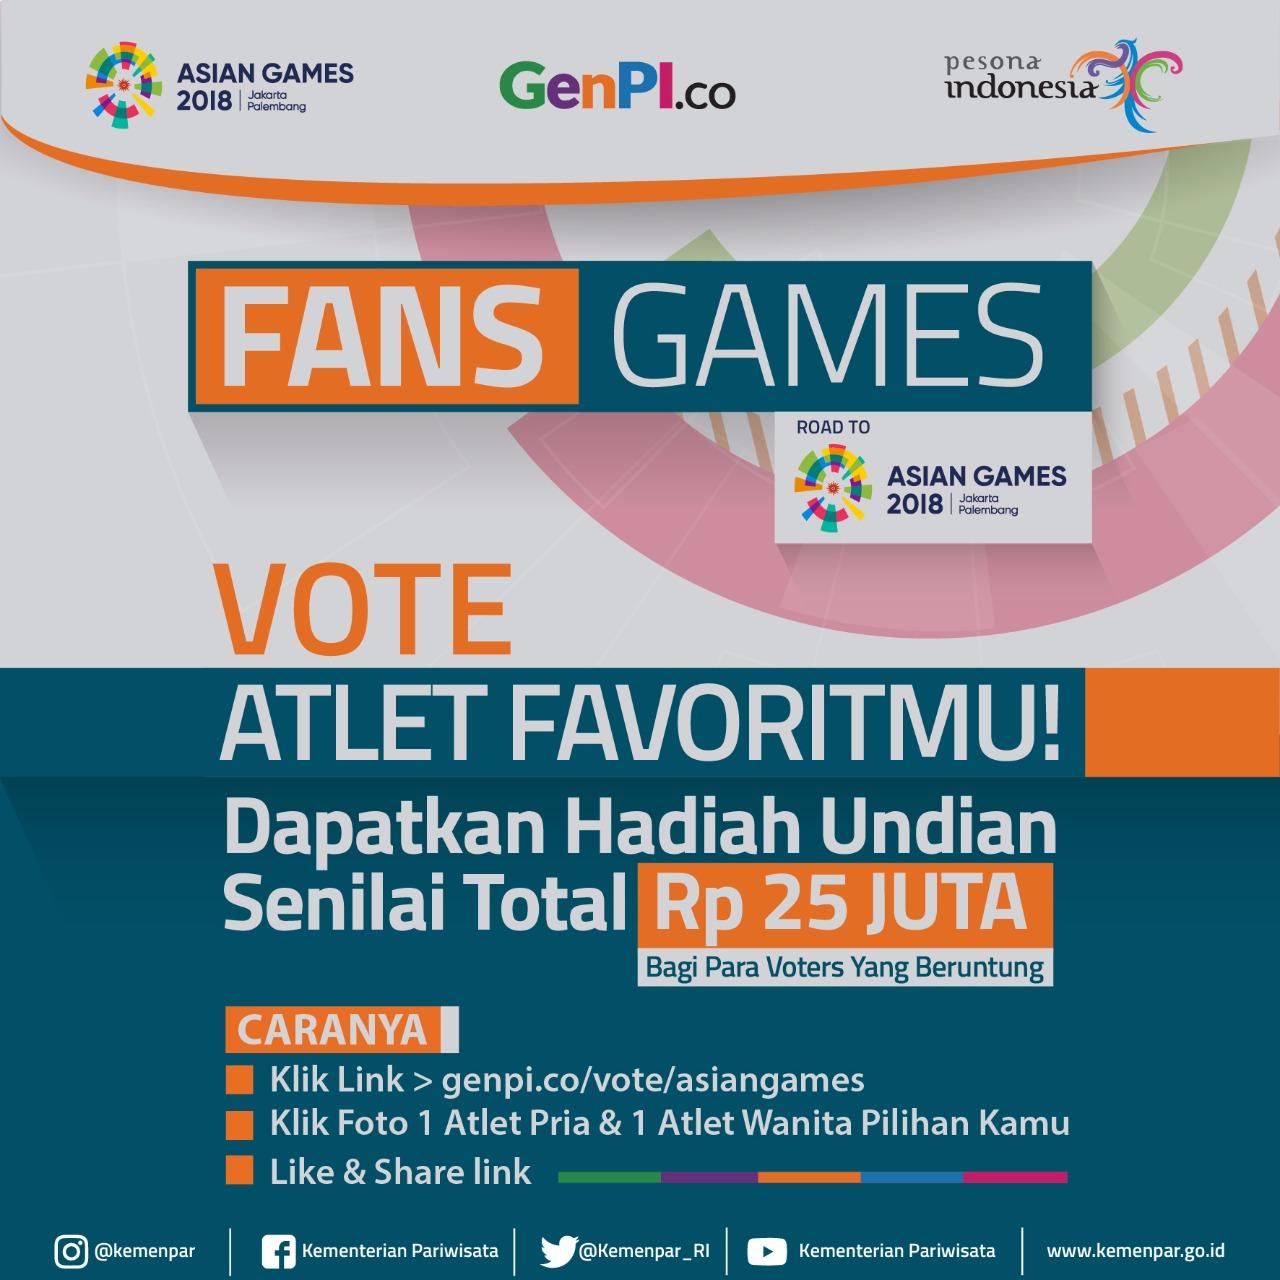 dtzncqin9uhp0v3ekxc5 16309 - Asian Games Vote